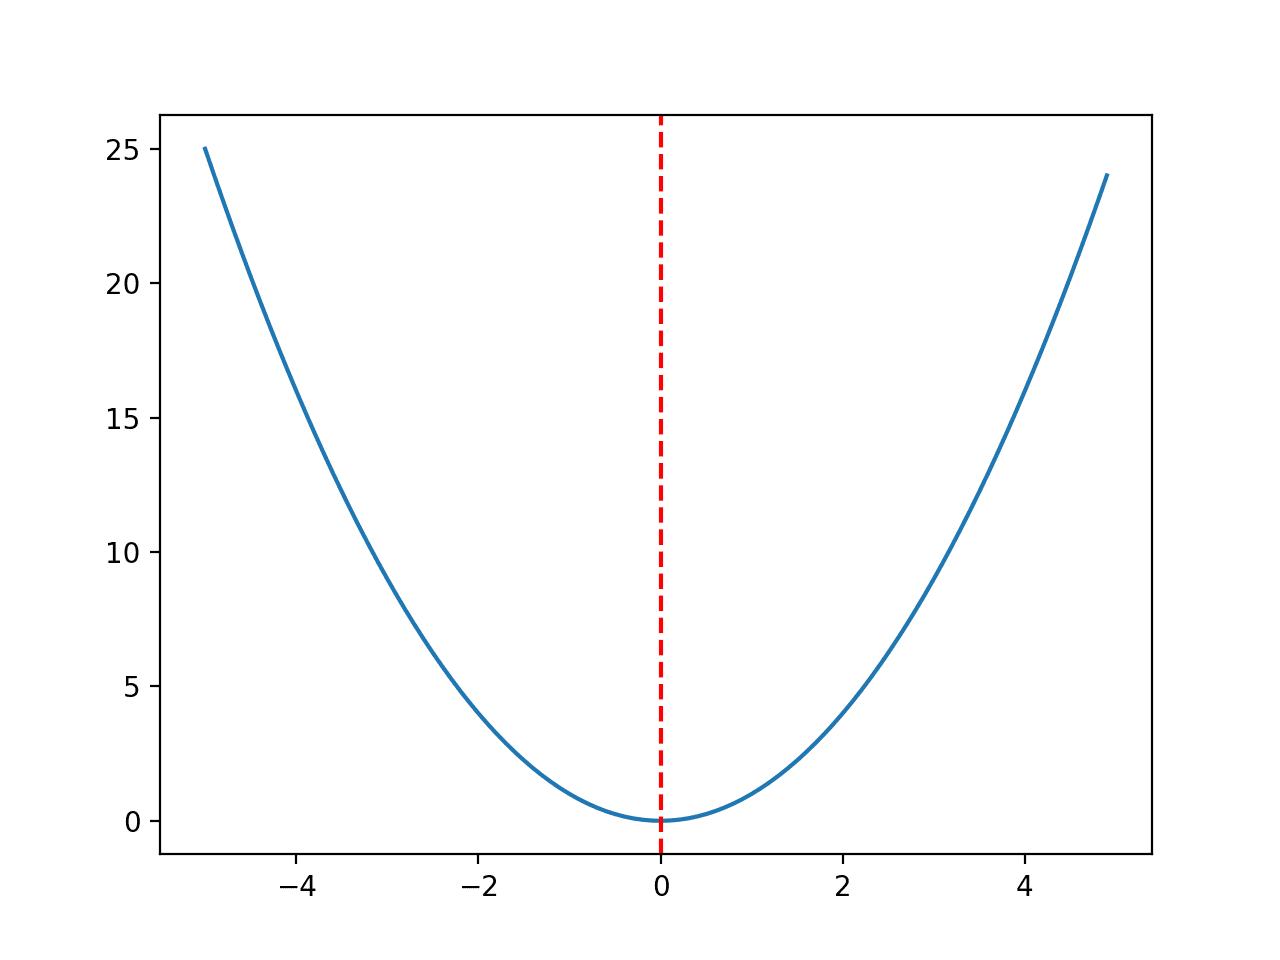 Line Plot of Convex Unimodal Optimization Function